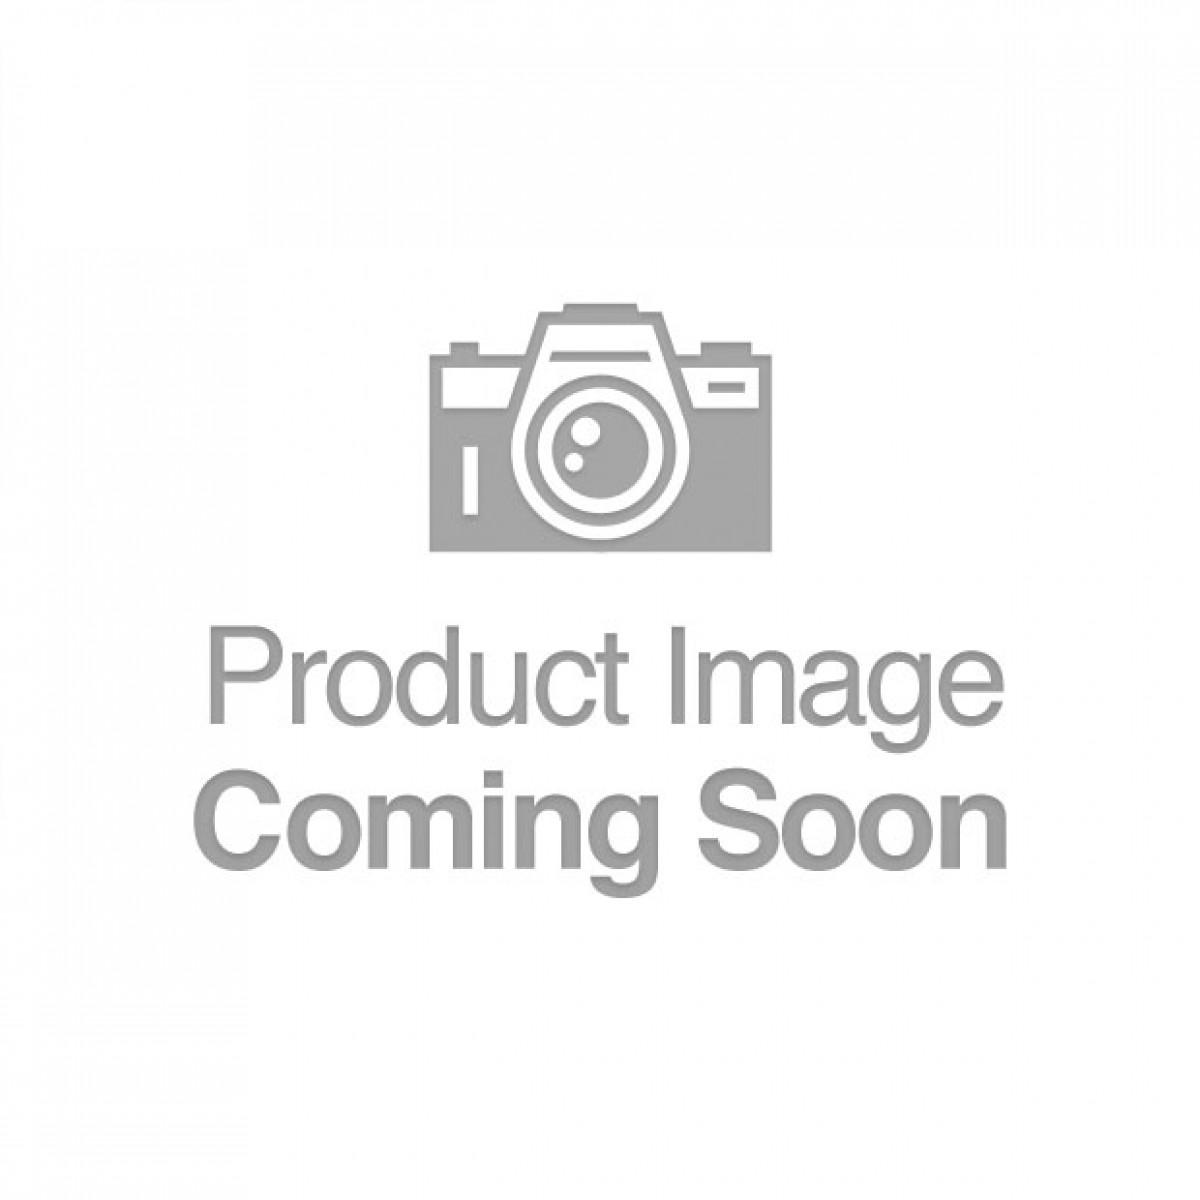 Curve Novelties Gossip Silicone Beaded Vibrator 50x - Magenta